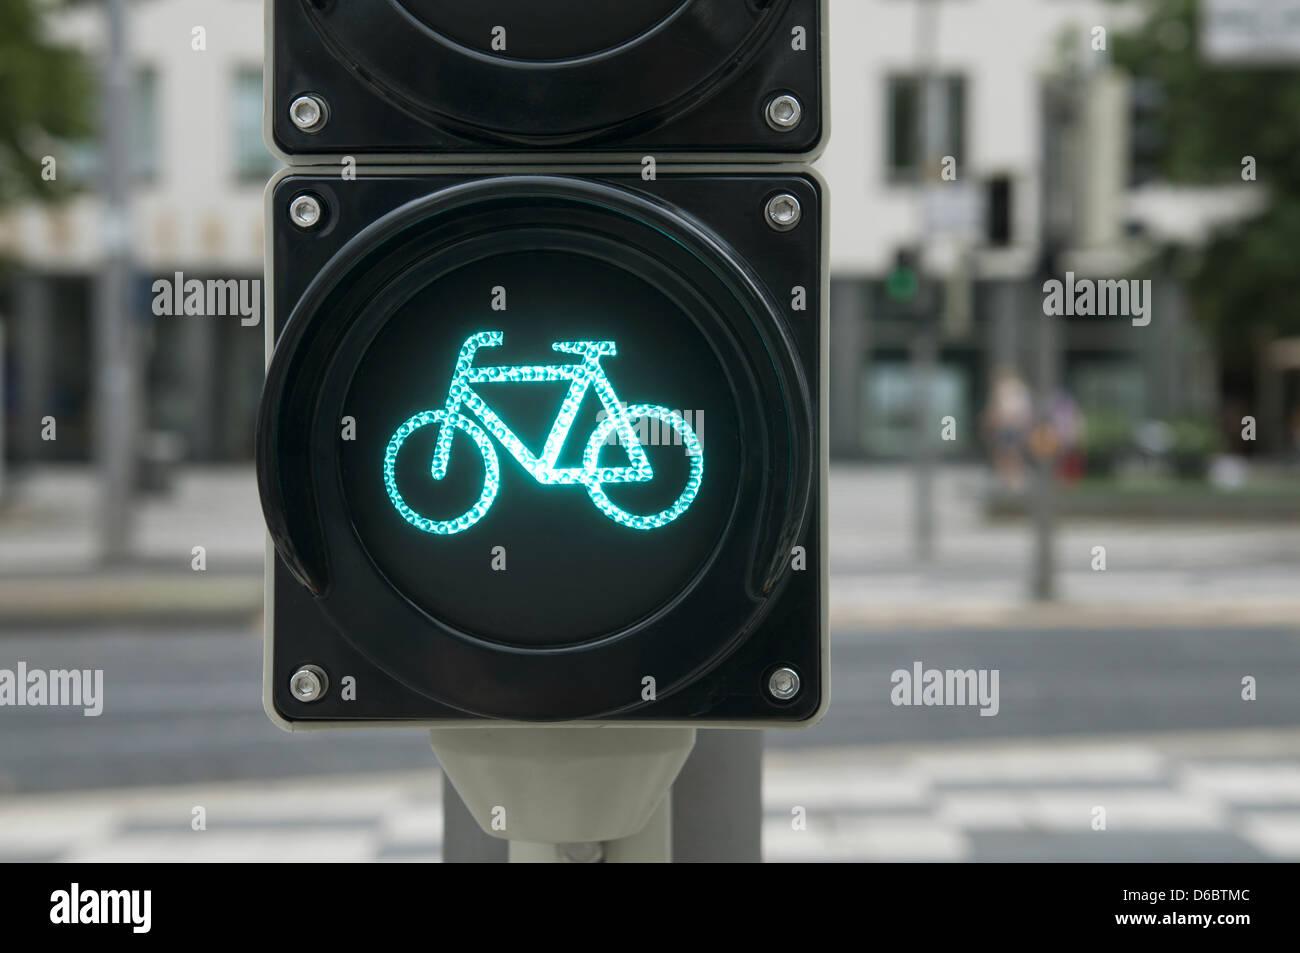 Led Bike Tail Light Heart In 2021 Bike Lights Bike Tail Light Bicycle Lights